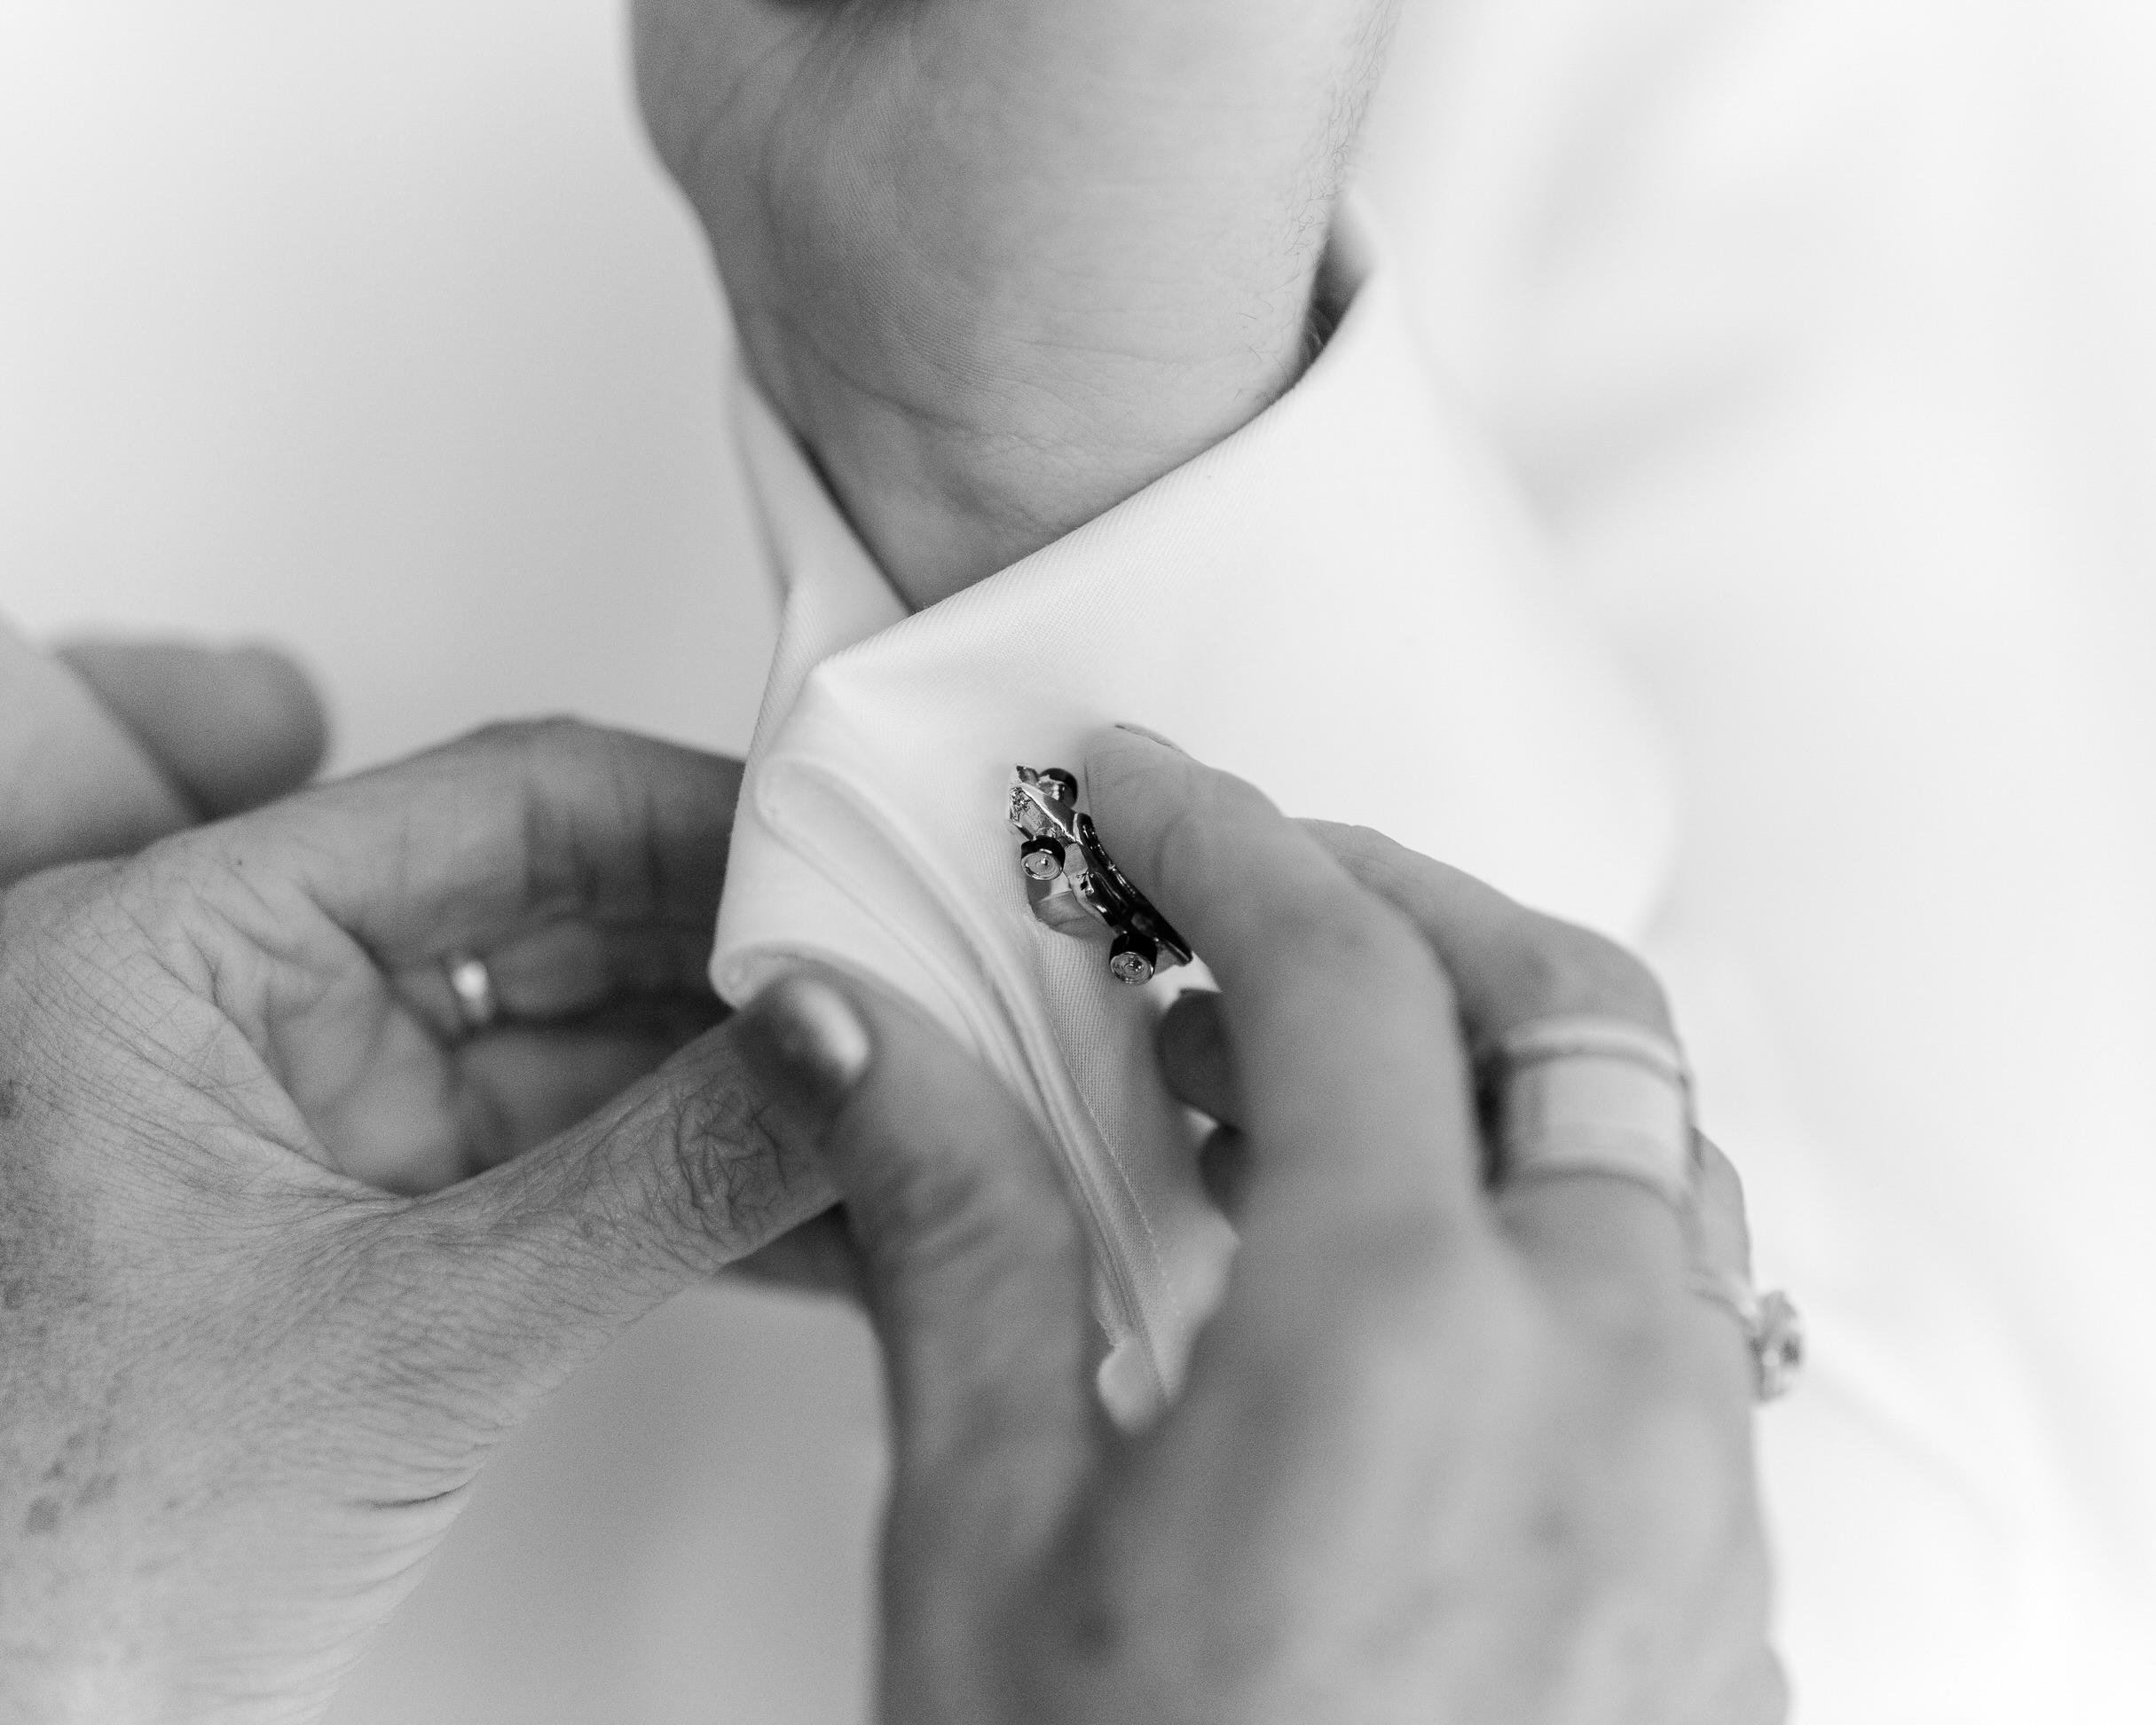 Justin_And_Jim_Photography_Chateau_Dore_Bendigo_Wedding8.JPG